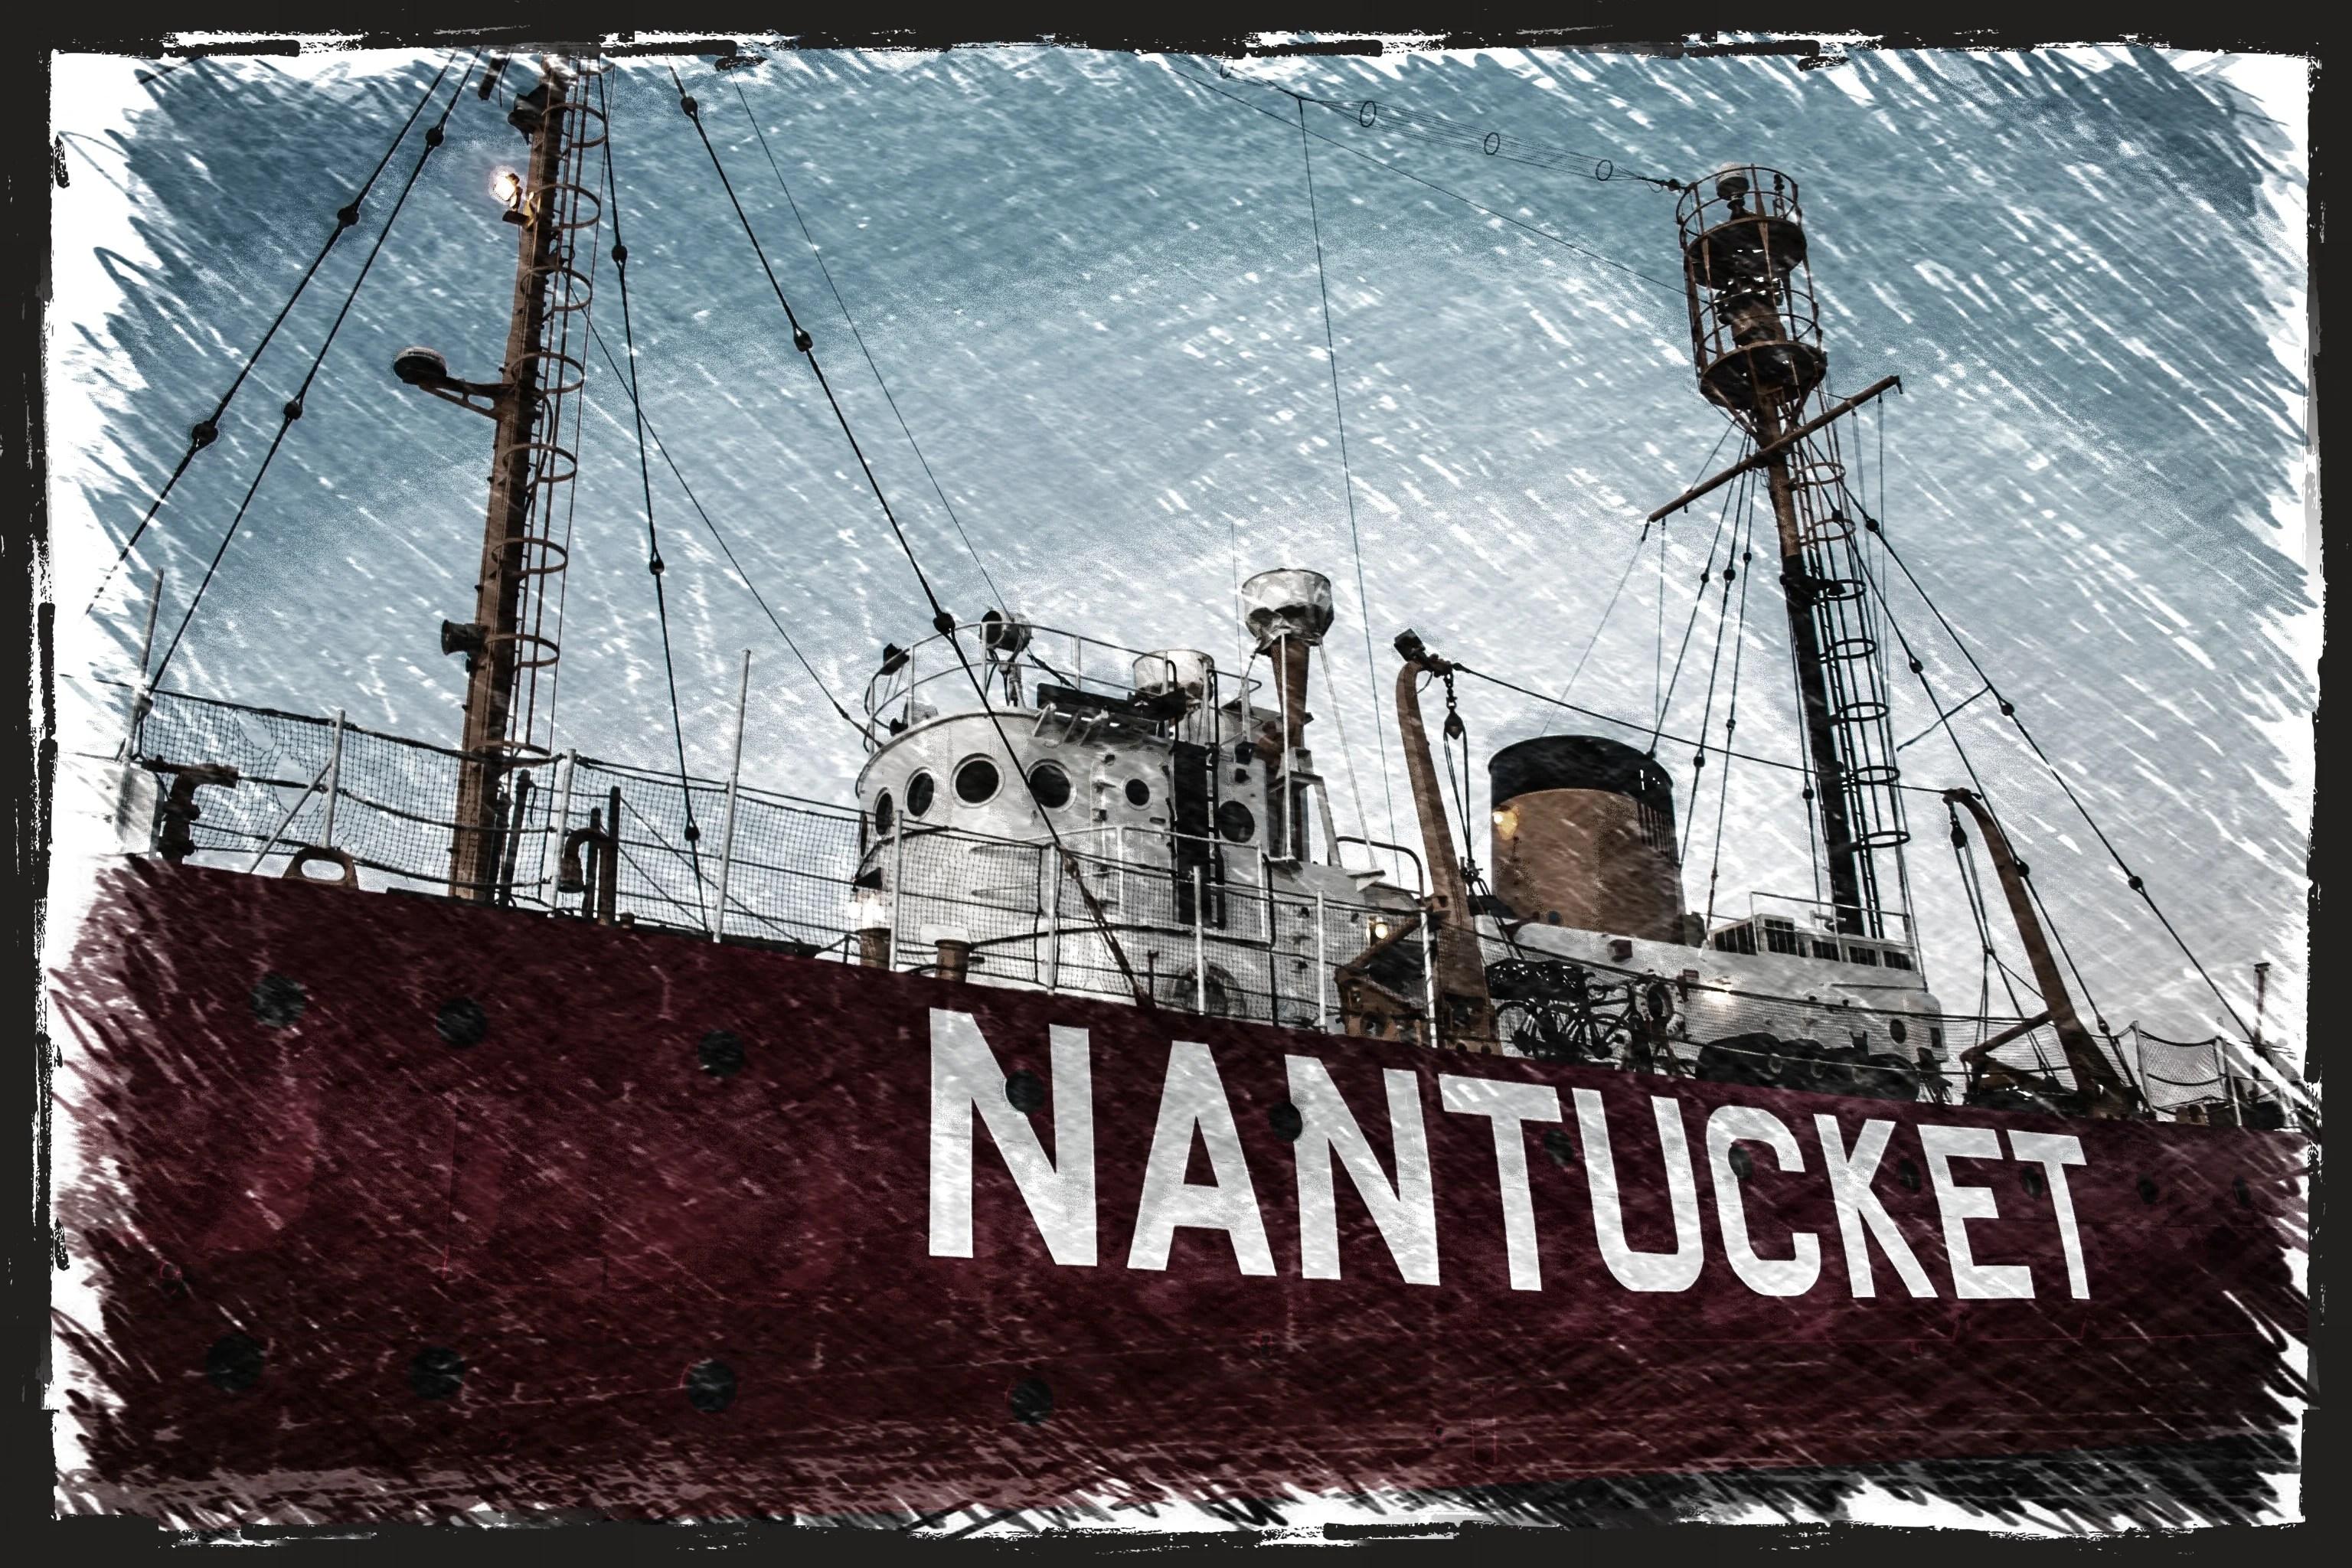 Nantucket Whaling Ship